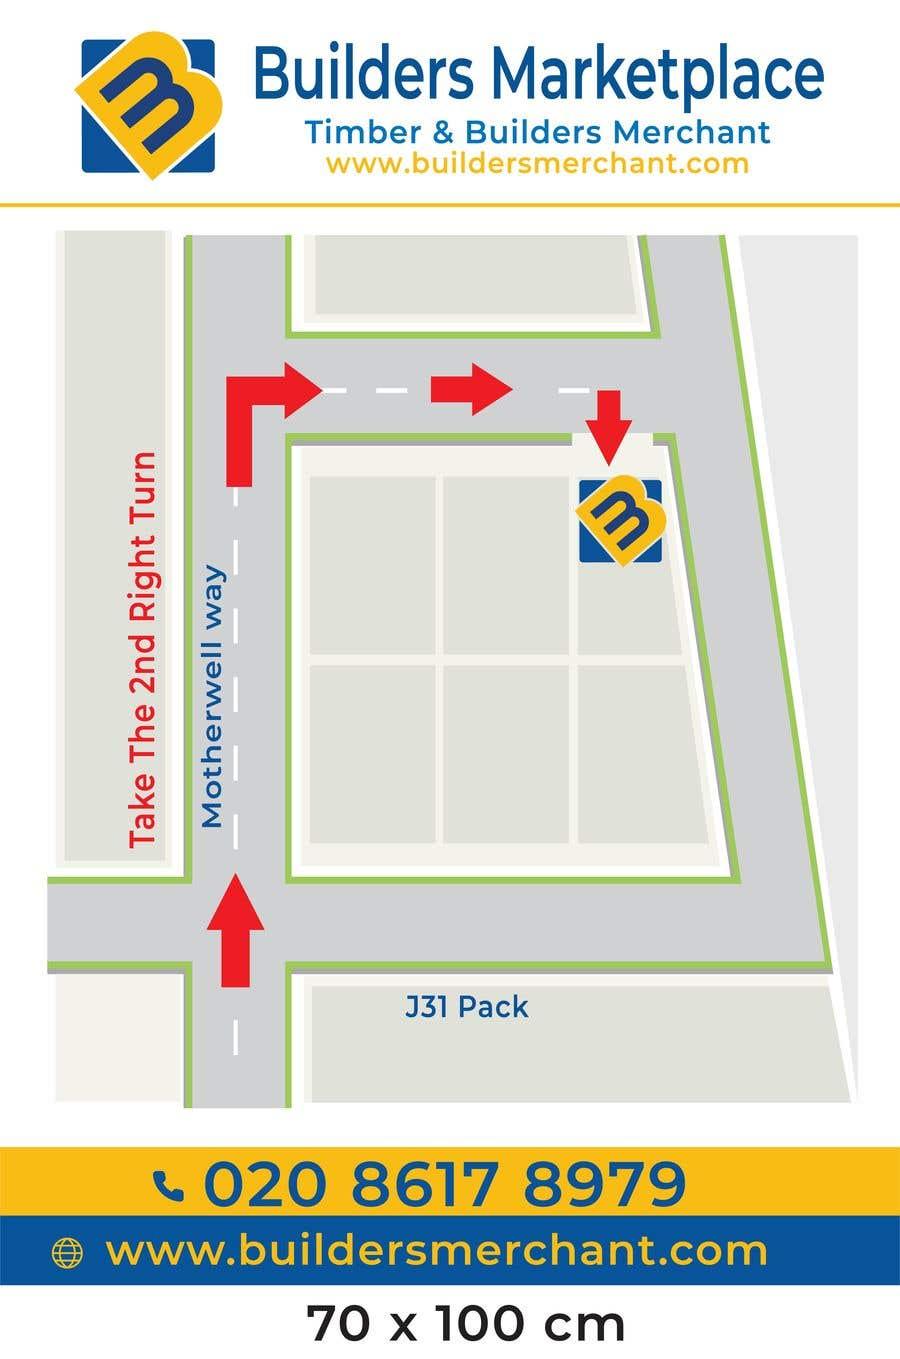 Konkurrenceindlæg #                                        19                                      for                                         Design a Direction Poster Map for Business